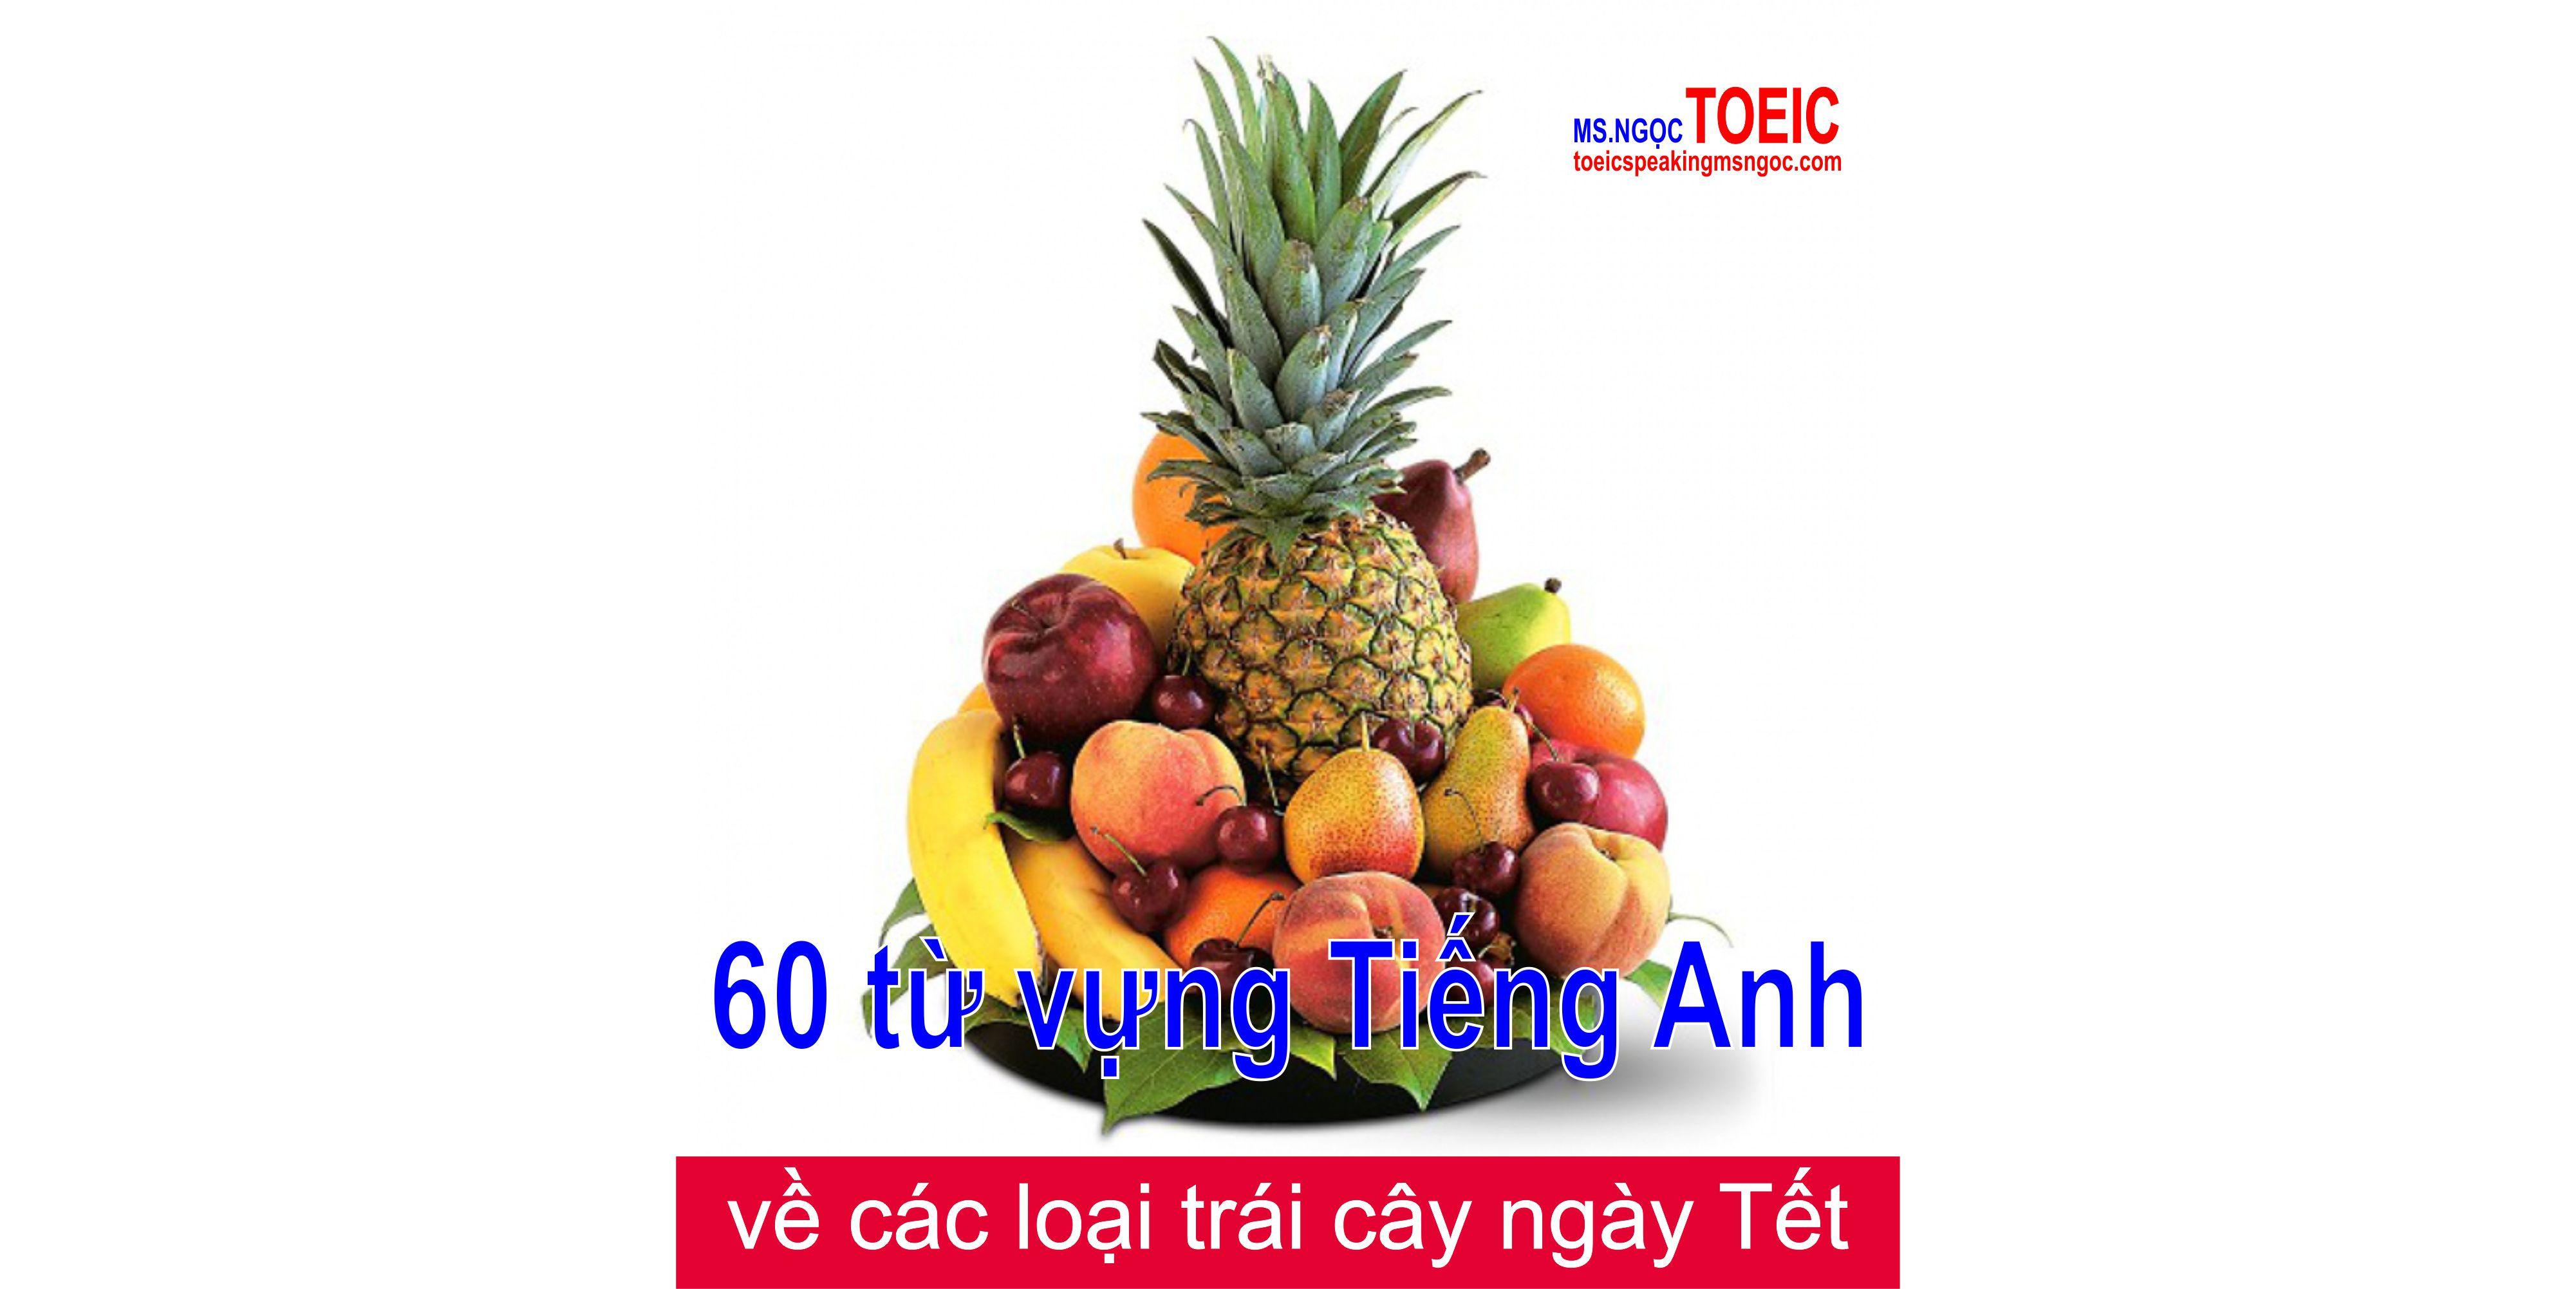 toeic-msngoc-top-60-tu-vung-tieng-anh-ve-cac-loai-trai-cay-ngay-tet-188